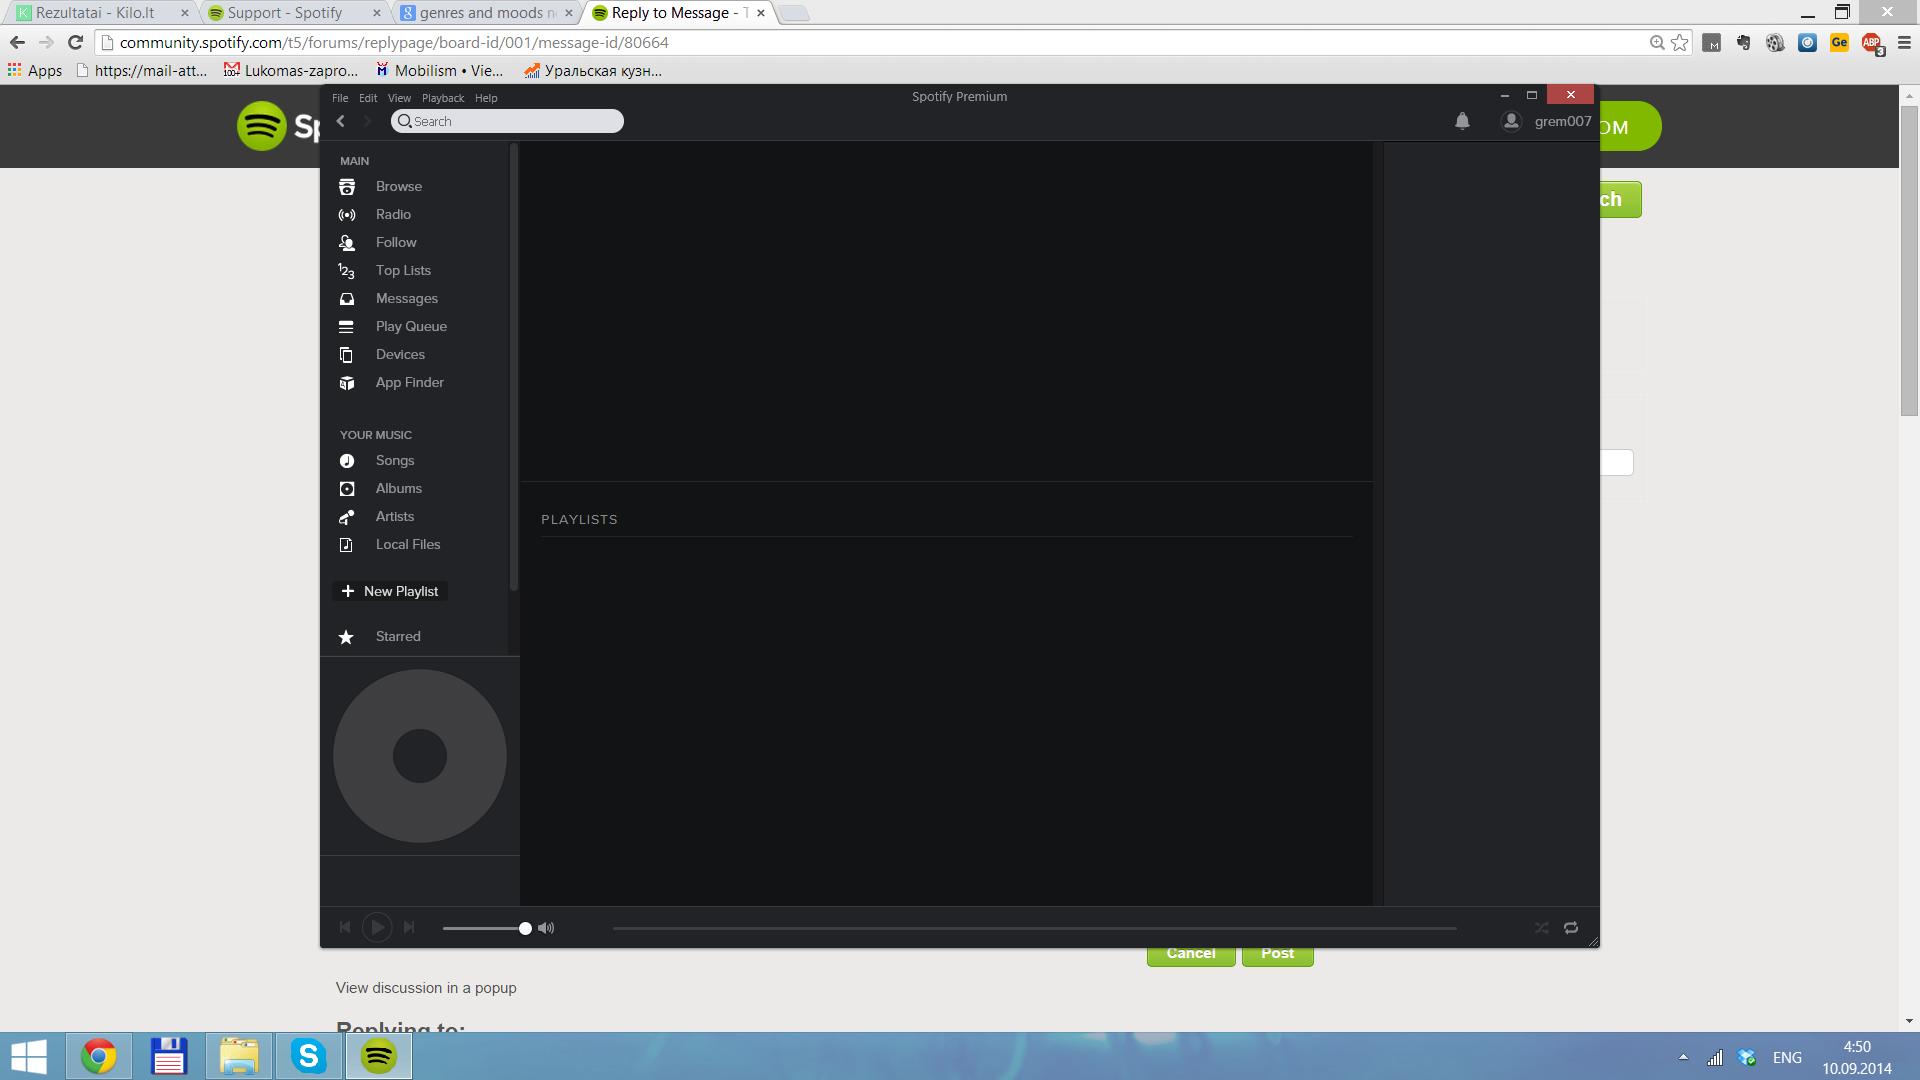 Screenshot 2014-09-10 04.50.51.png